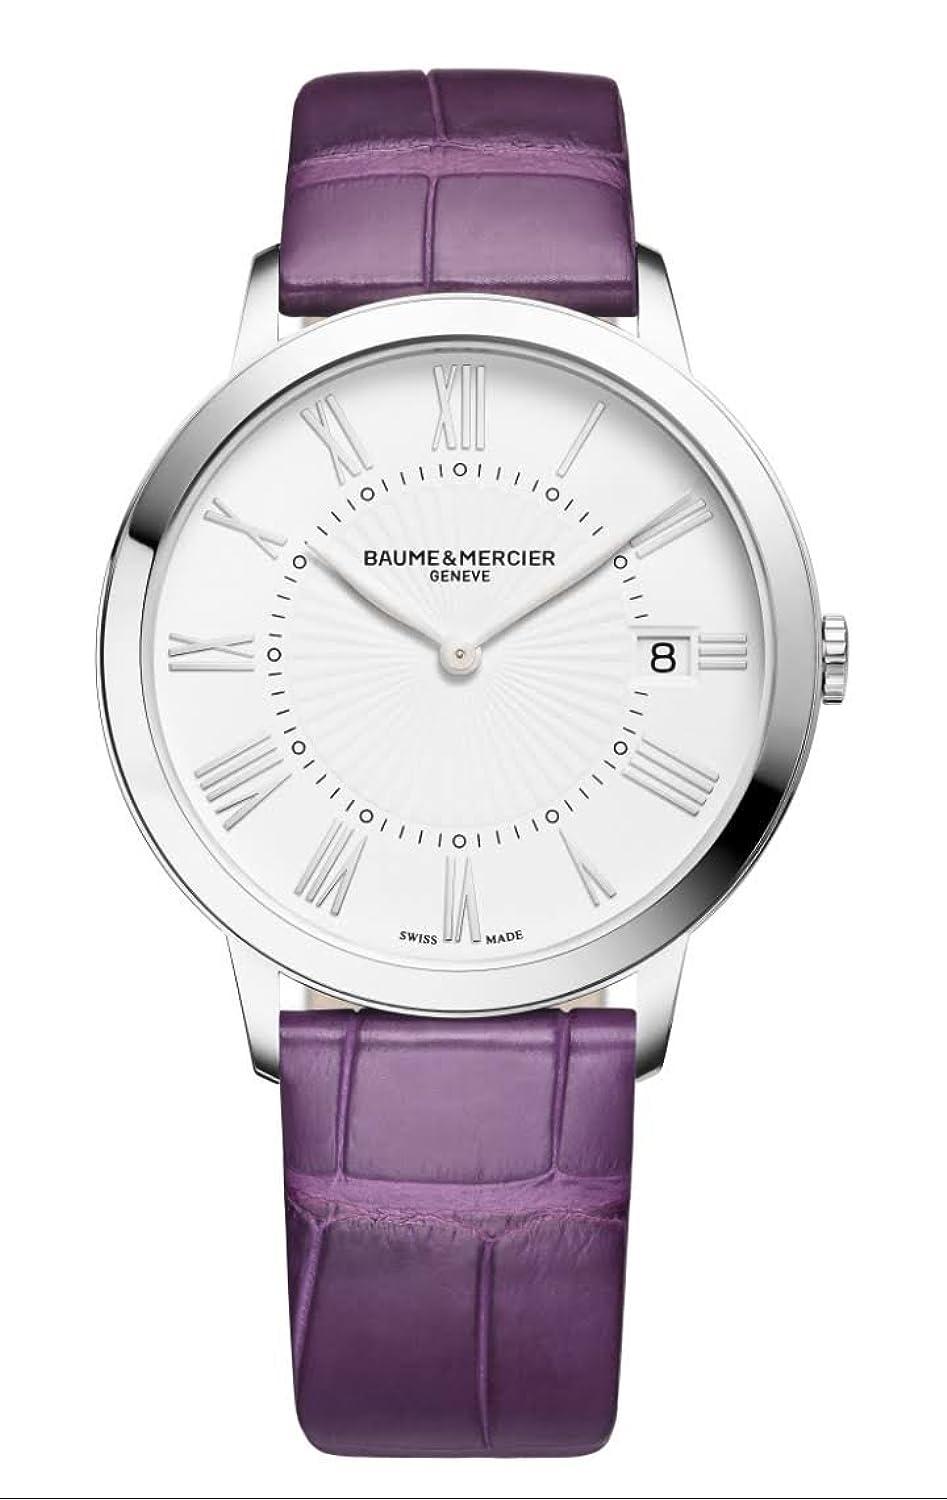 Baume & Mercier moa10224 Armbanduhr Damen Stahl Armband Alligator violett